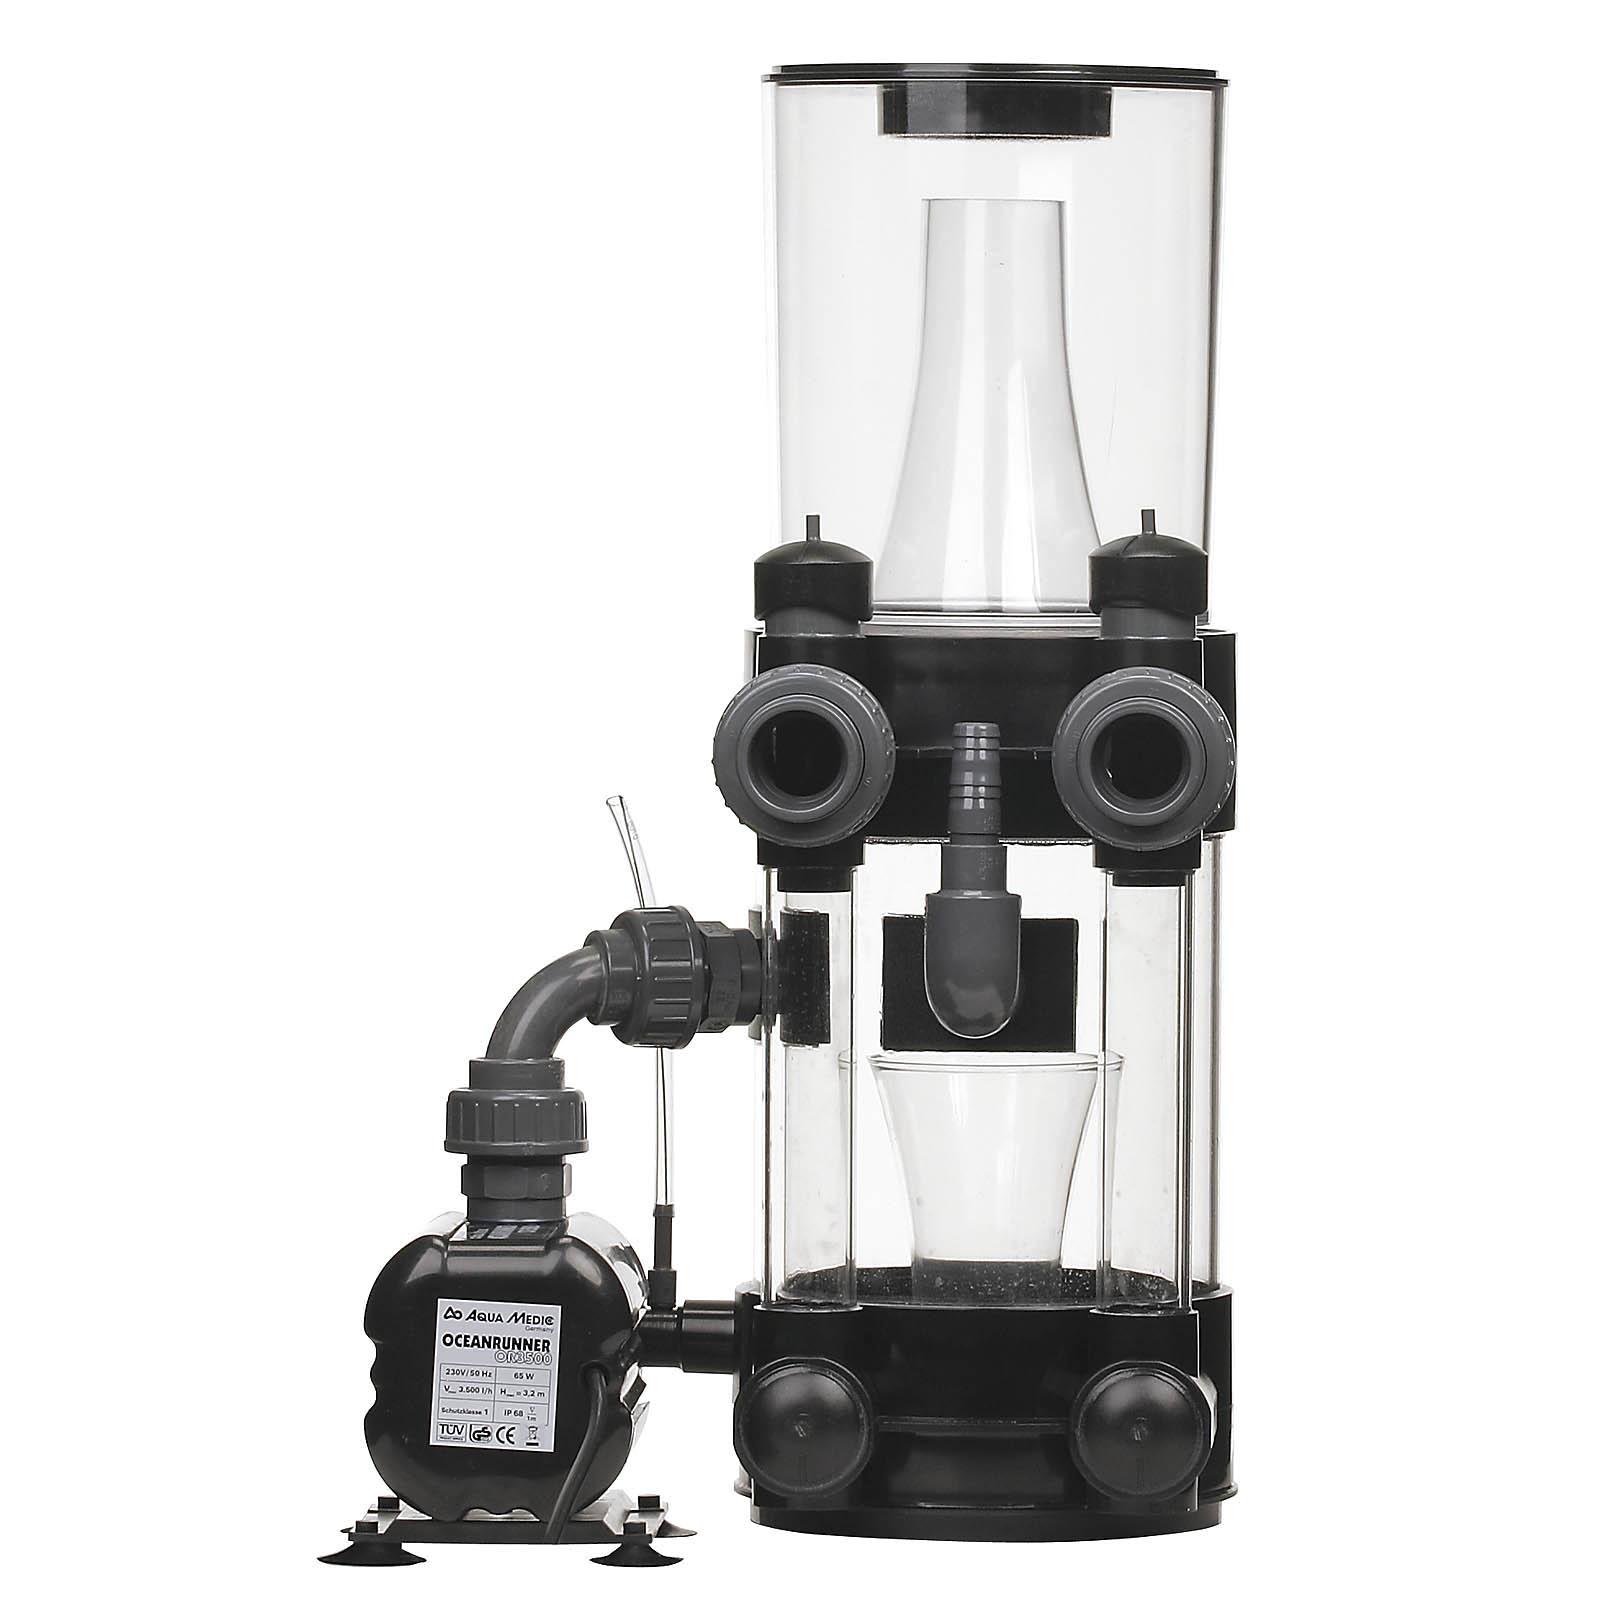 AQUA MEDIC Turboflotor 5000 Shorty Compact écumeur externe pour aquarium jusqu\'à 1500 L